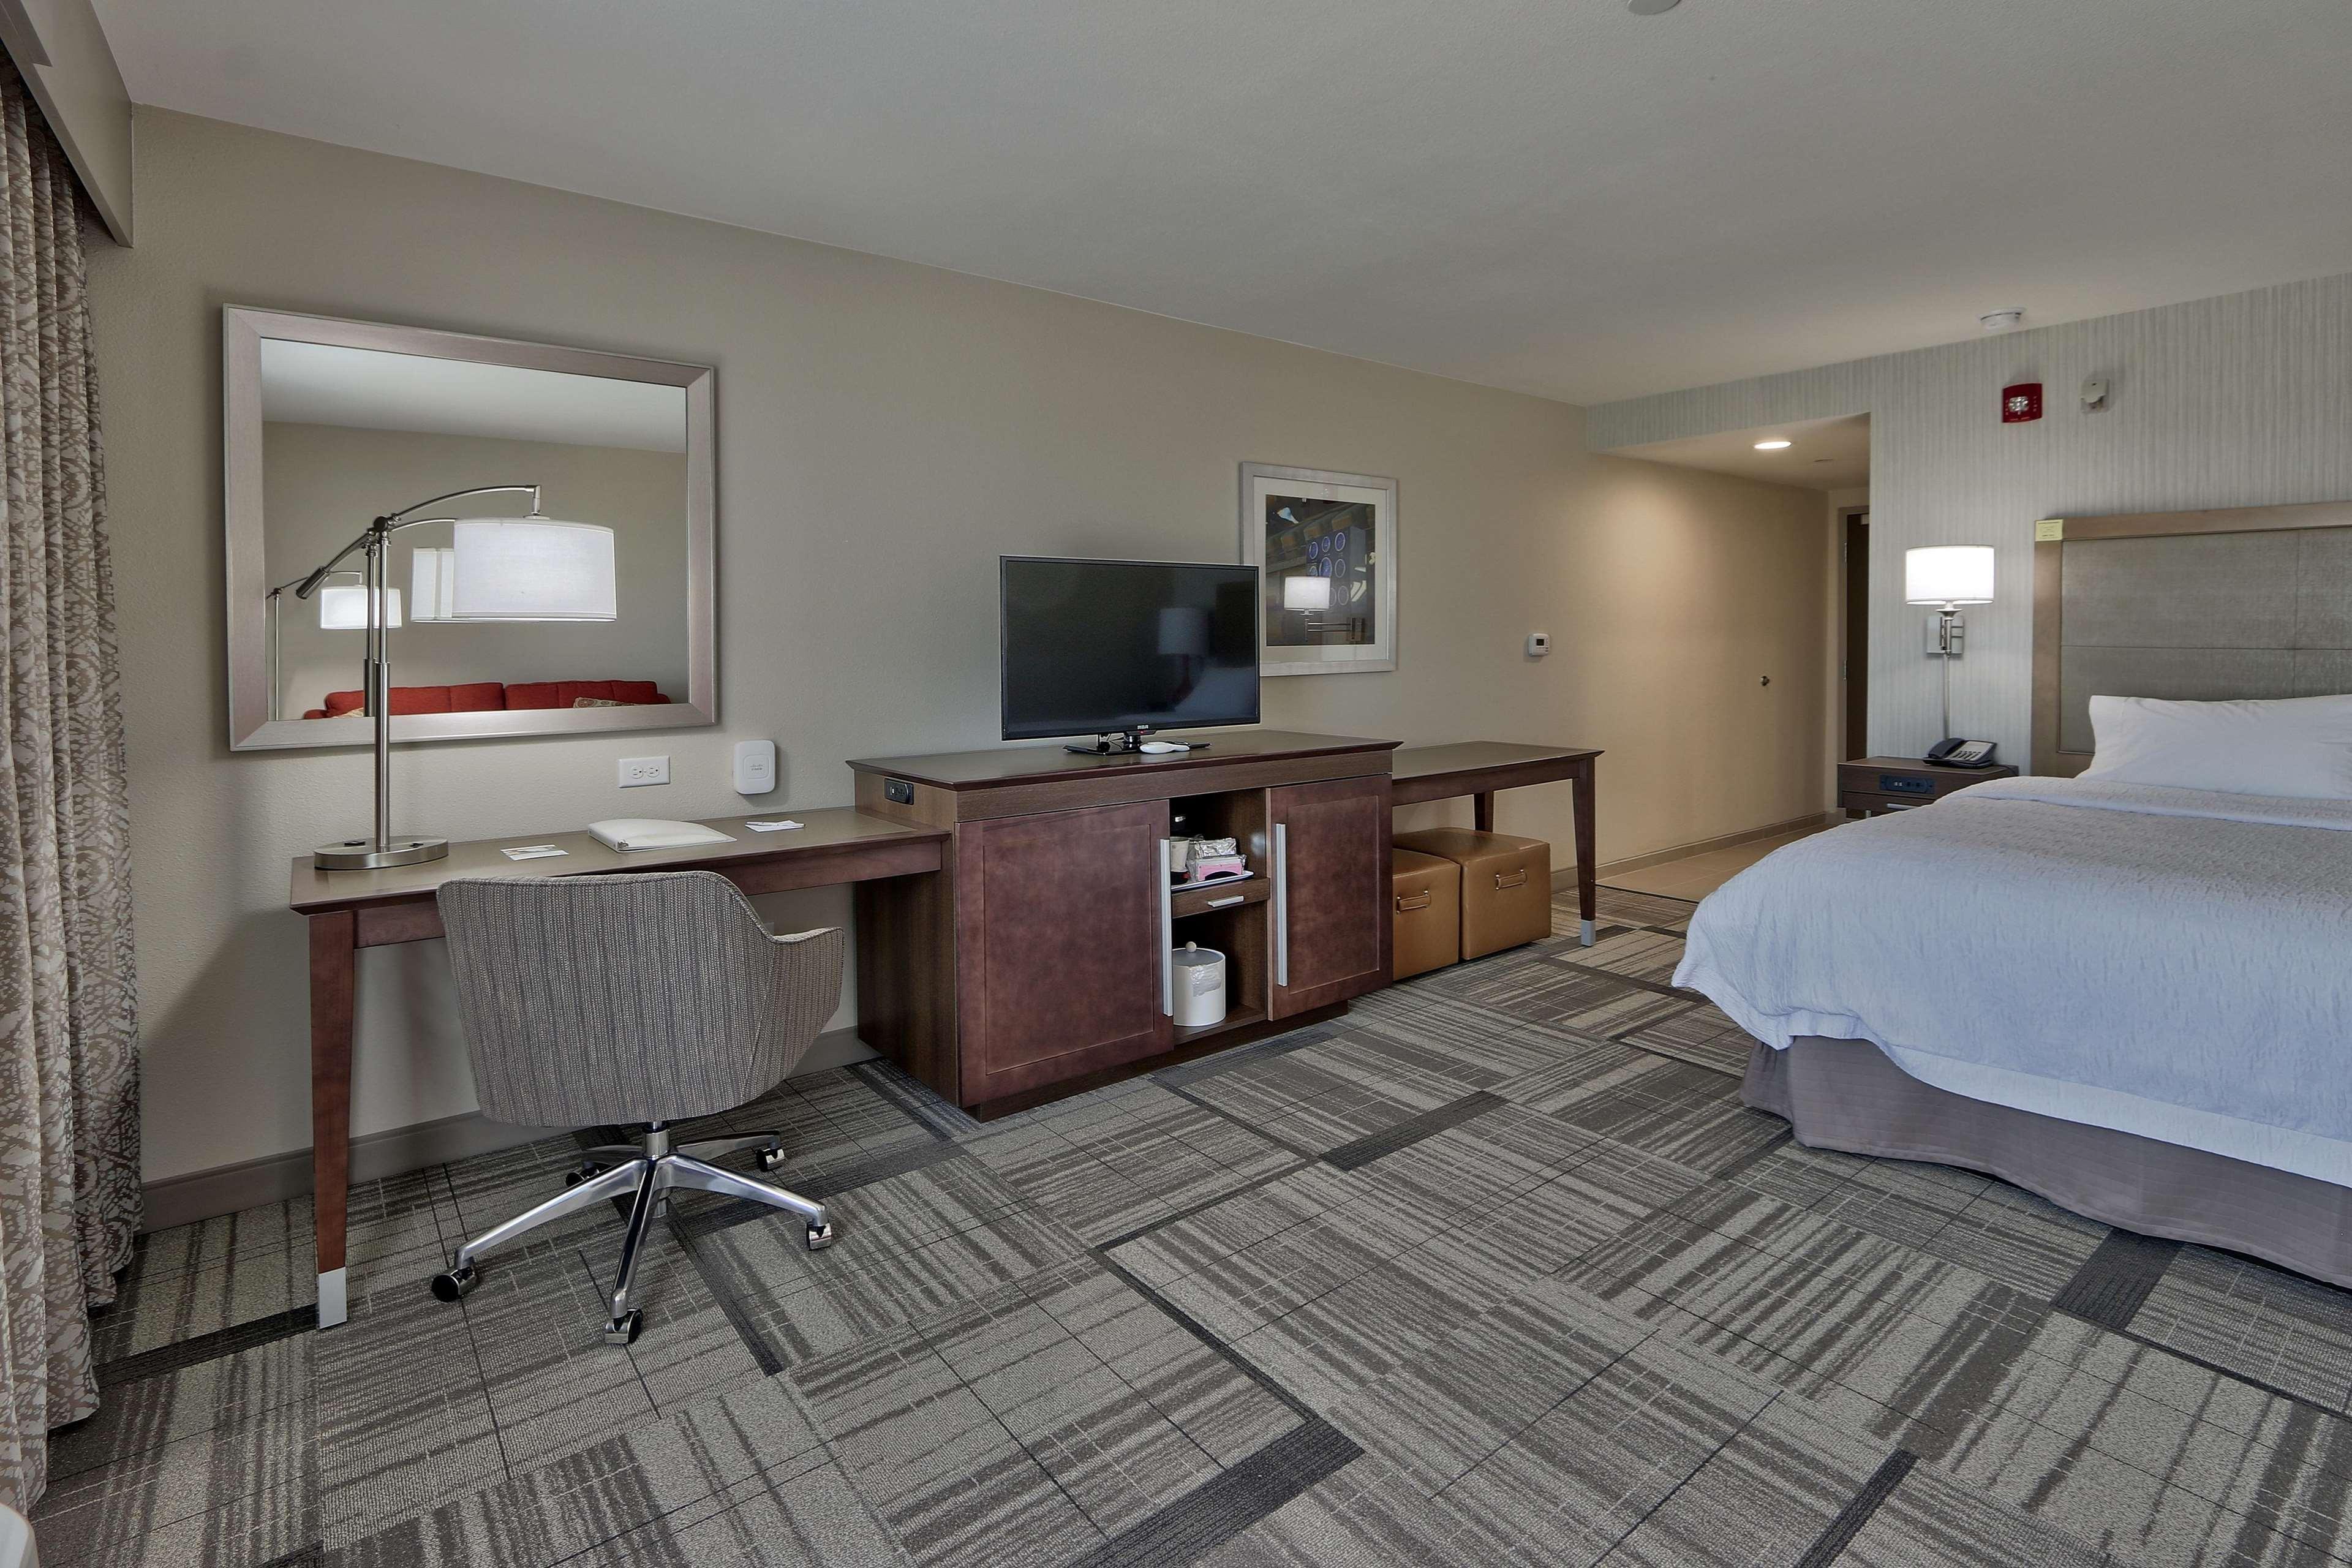 Hampton Inn & Suites Artesia image 5